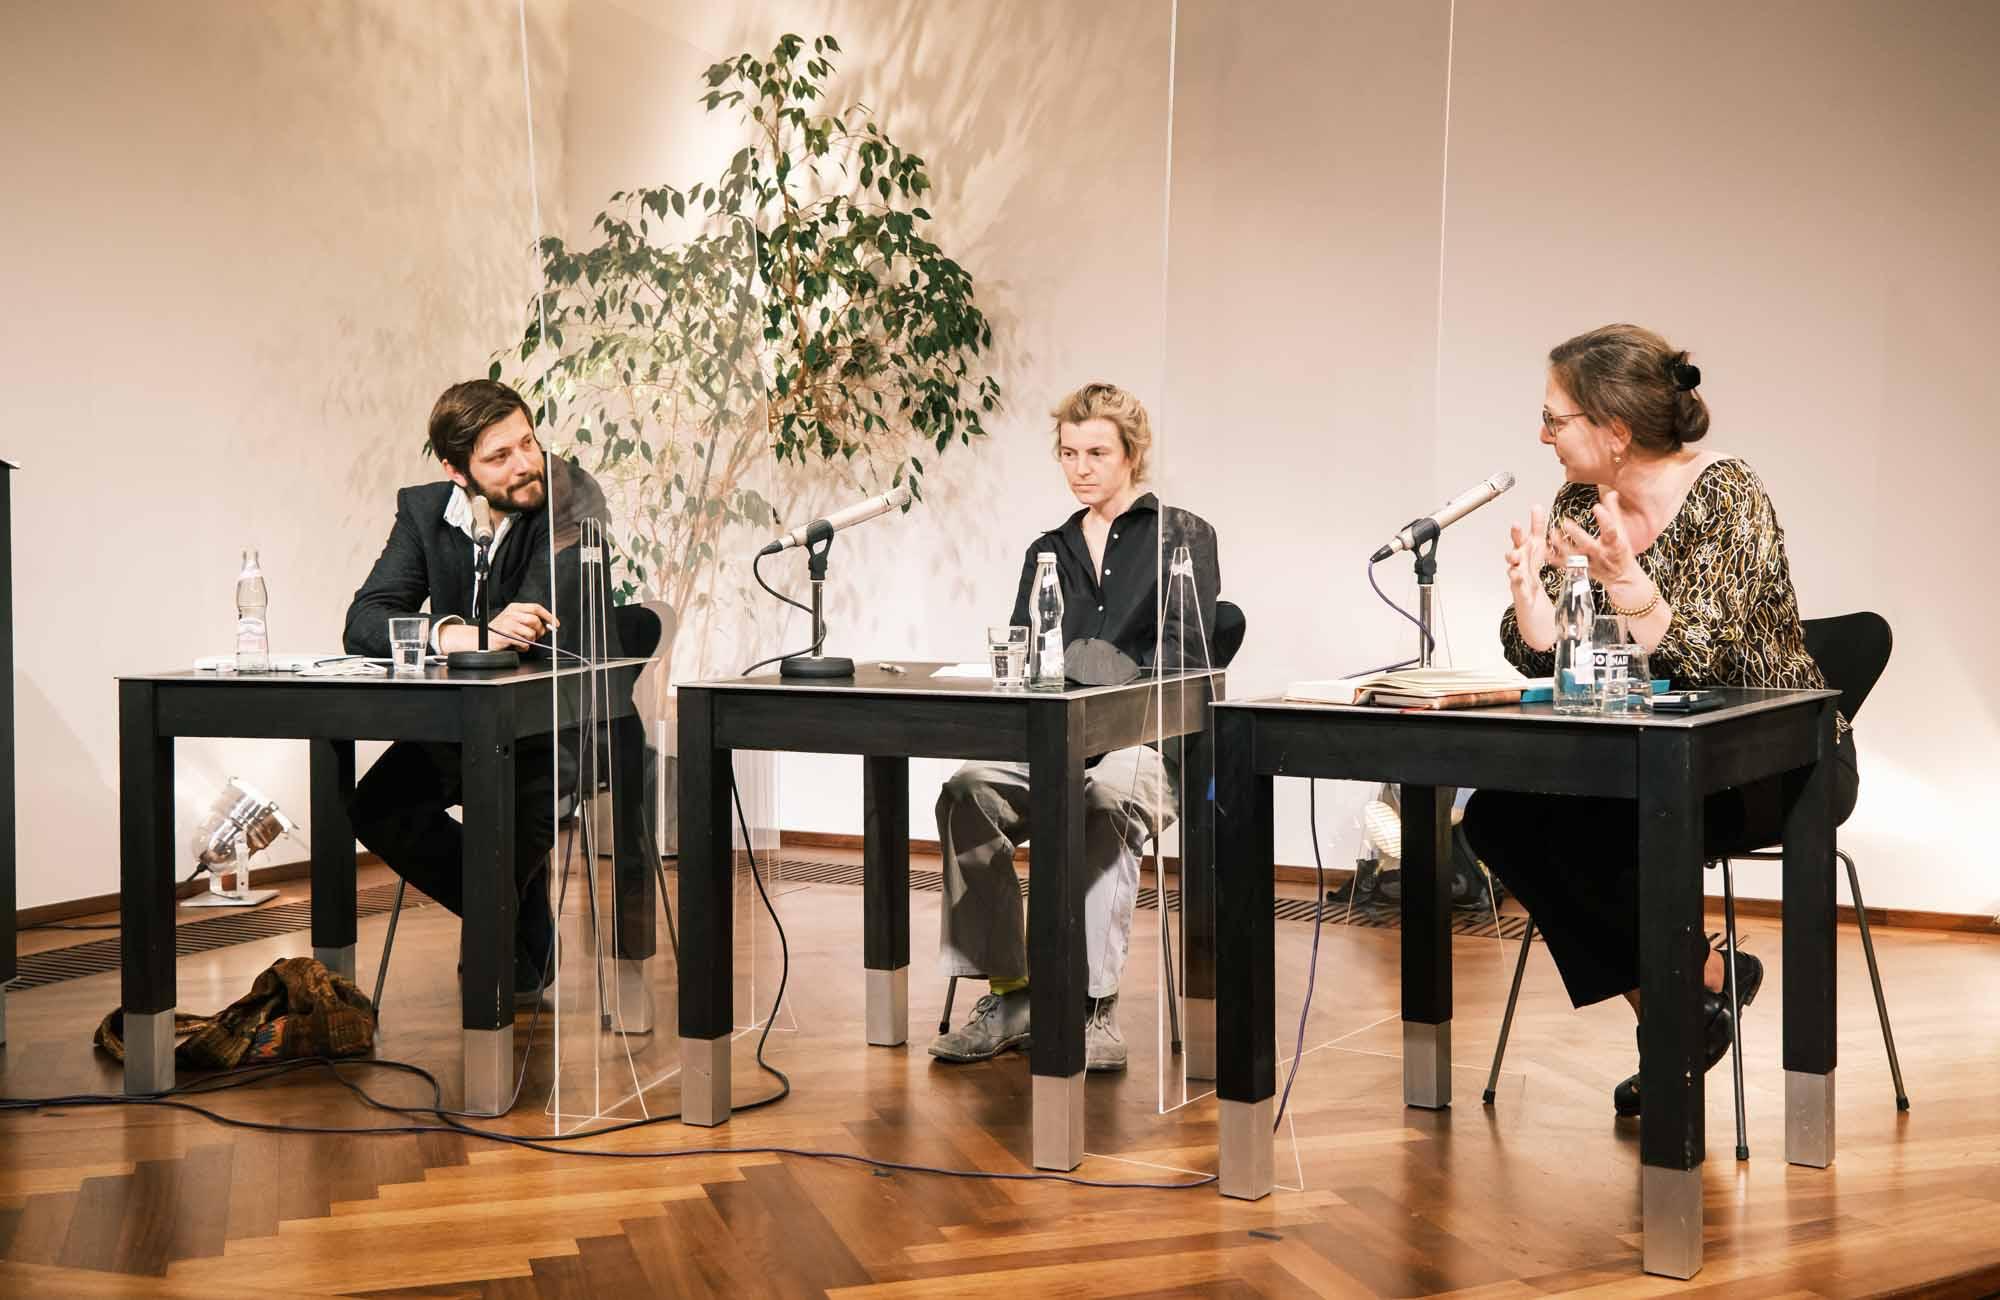 Joseph Vogl, Anne Applebaum, Ruth Wodak, Henning Lobin, Alexandru Bulucz, Ann Cotten: LOSGESAGT! <br/>(c) Sebastian Wenzel